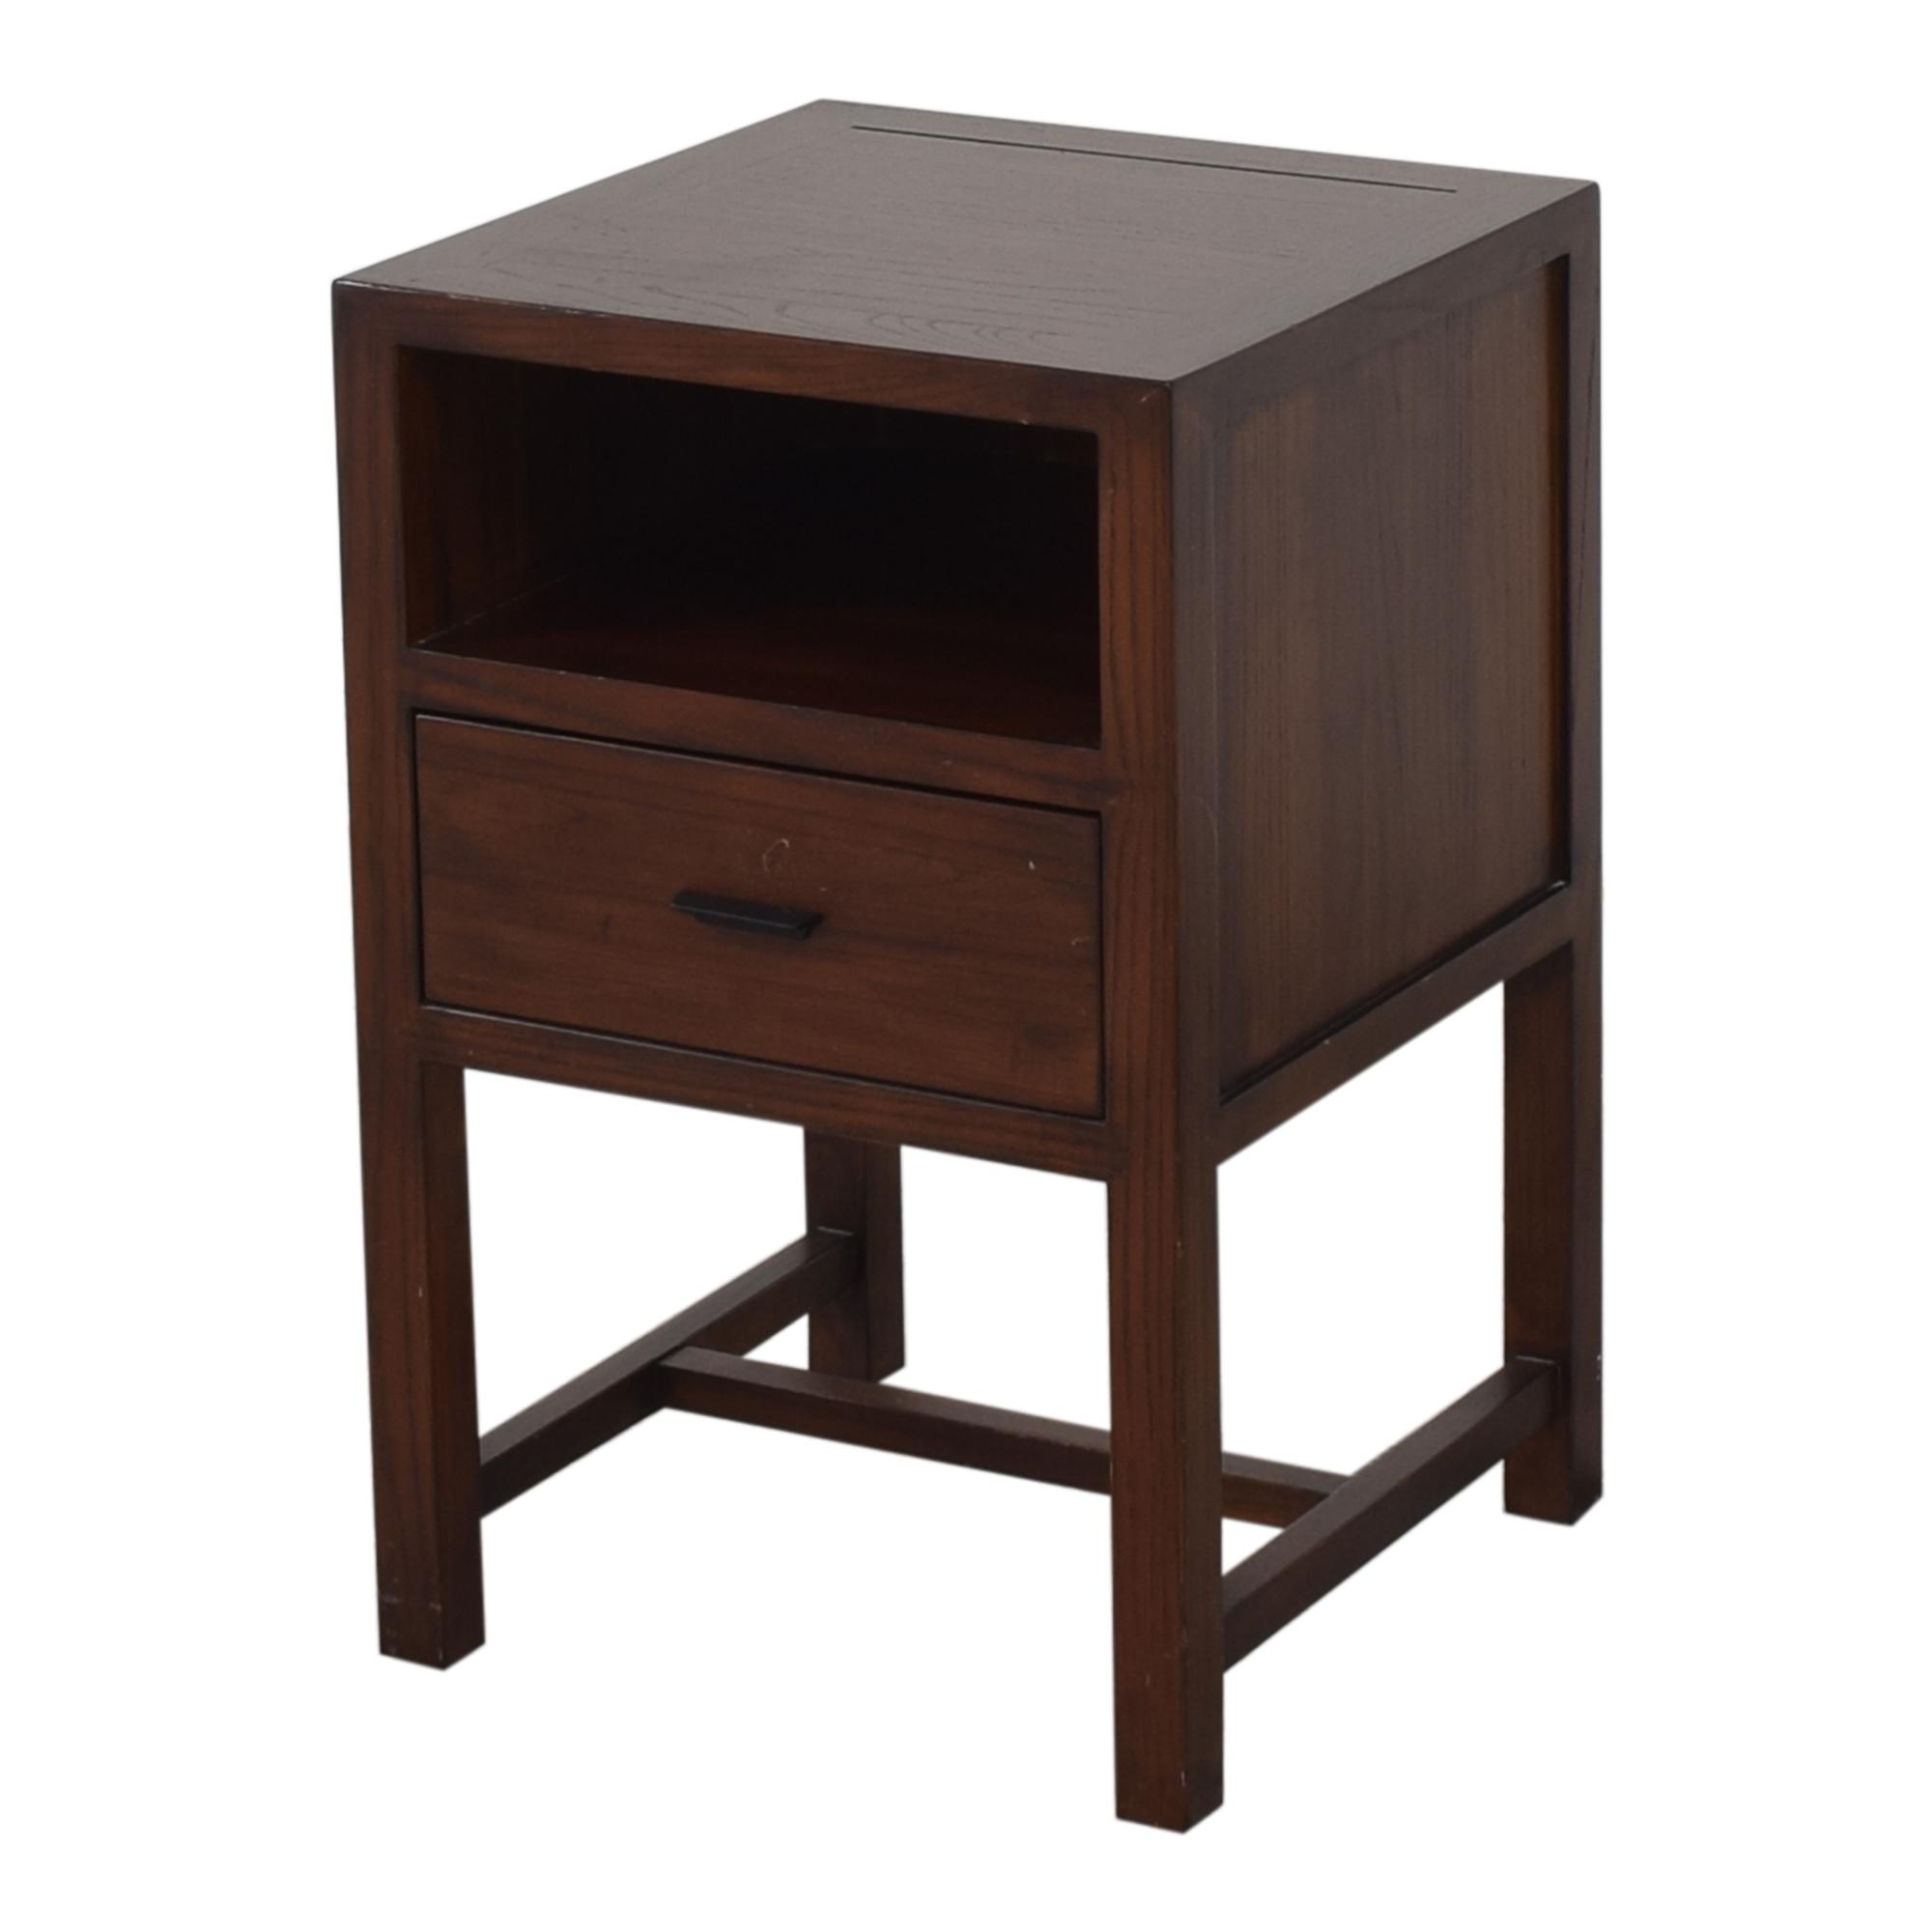 Modern One Drawer Nightstand price